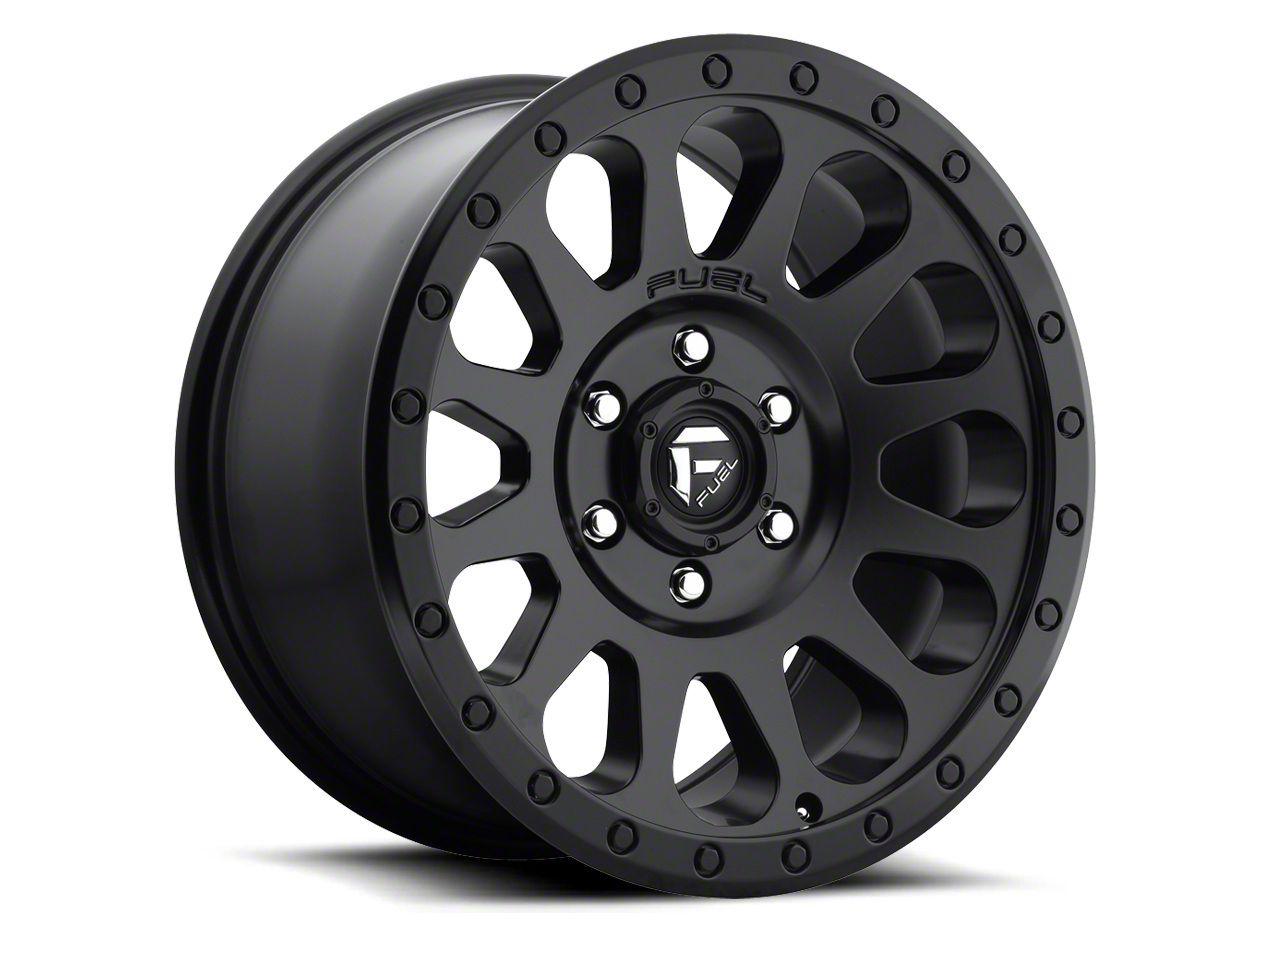 Fuel Wheels Vector Matte Black 6-Lug Wheel - 20x10 (04-19 F-150)